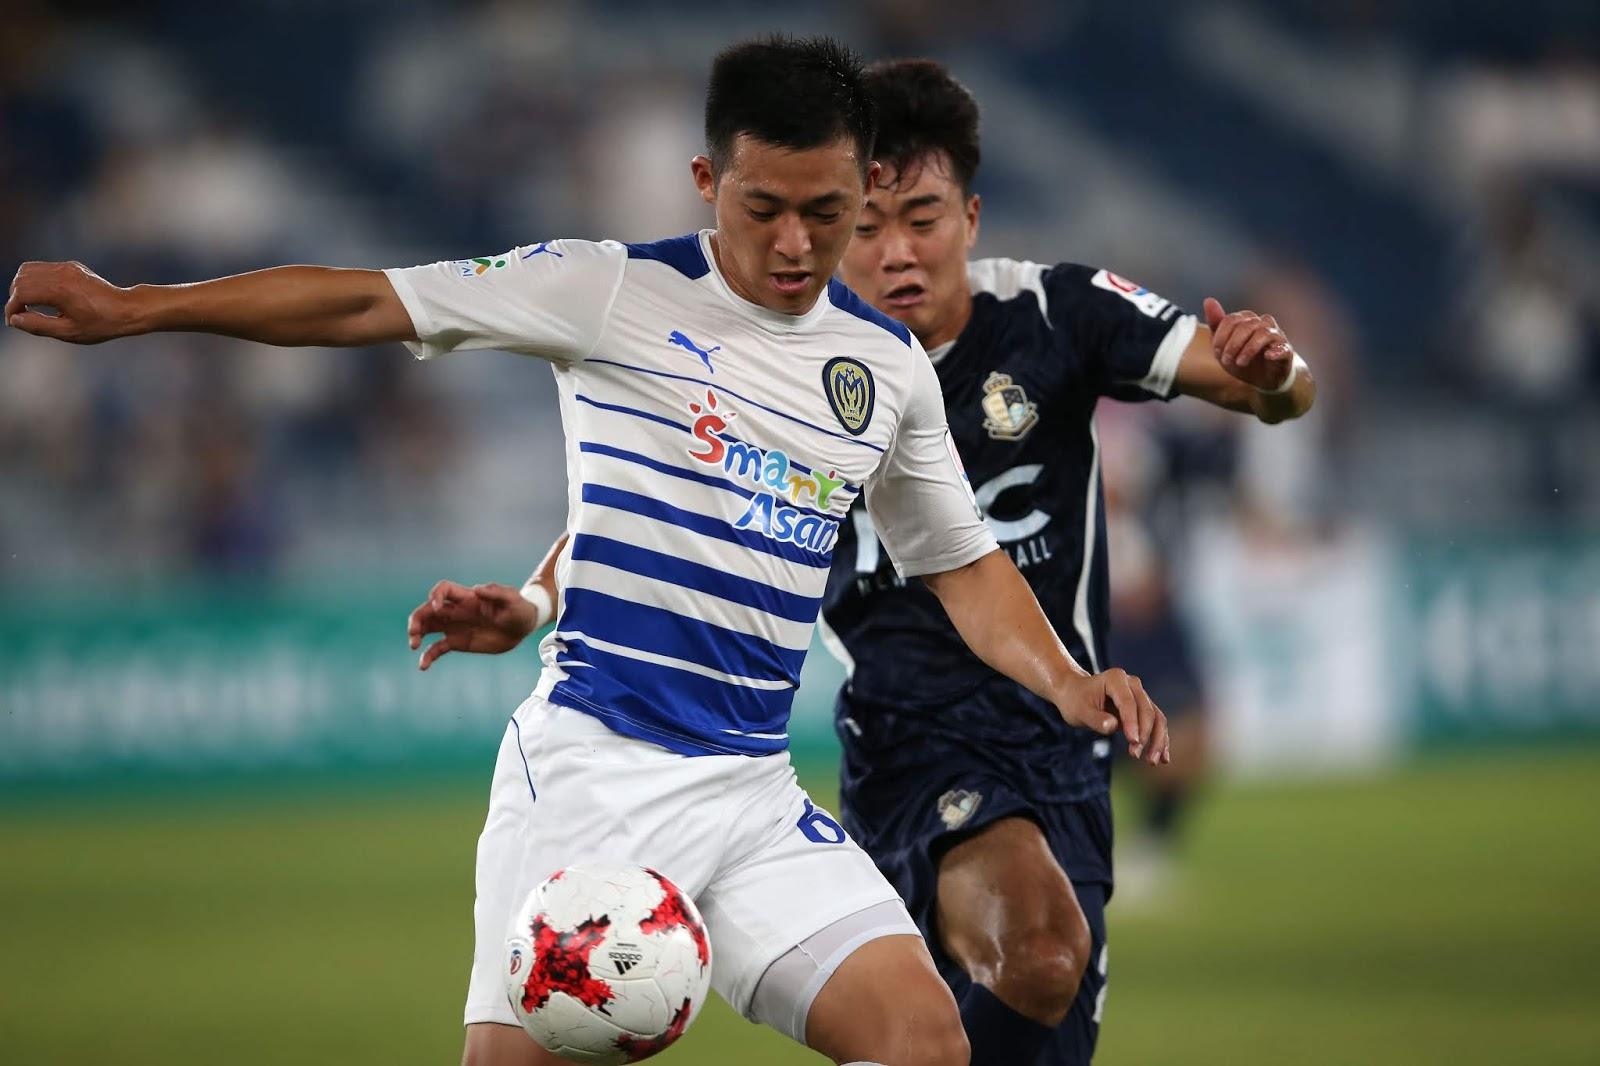 K League 2 Preview: Seoul E-Land vs Asan Mugunghwa